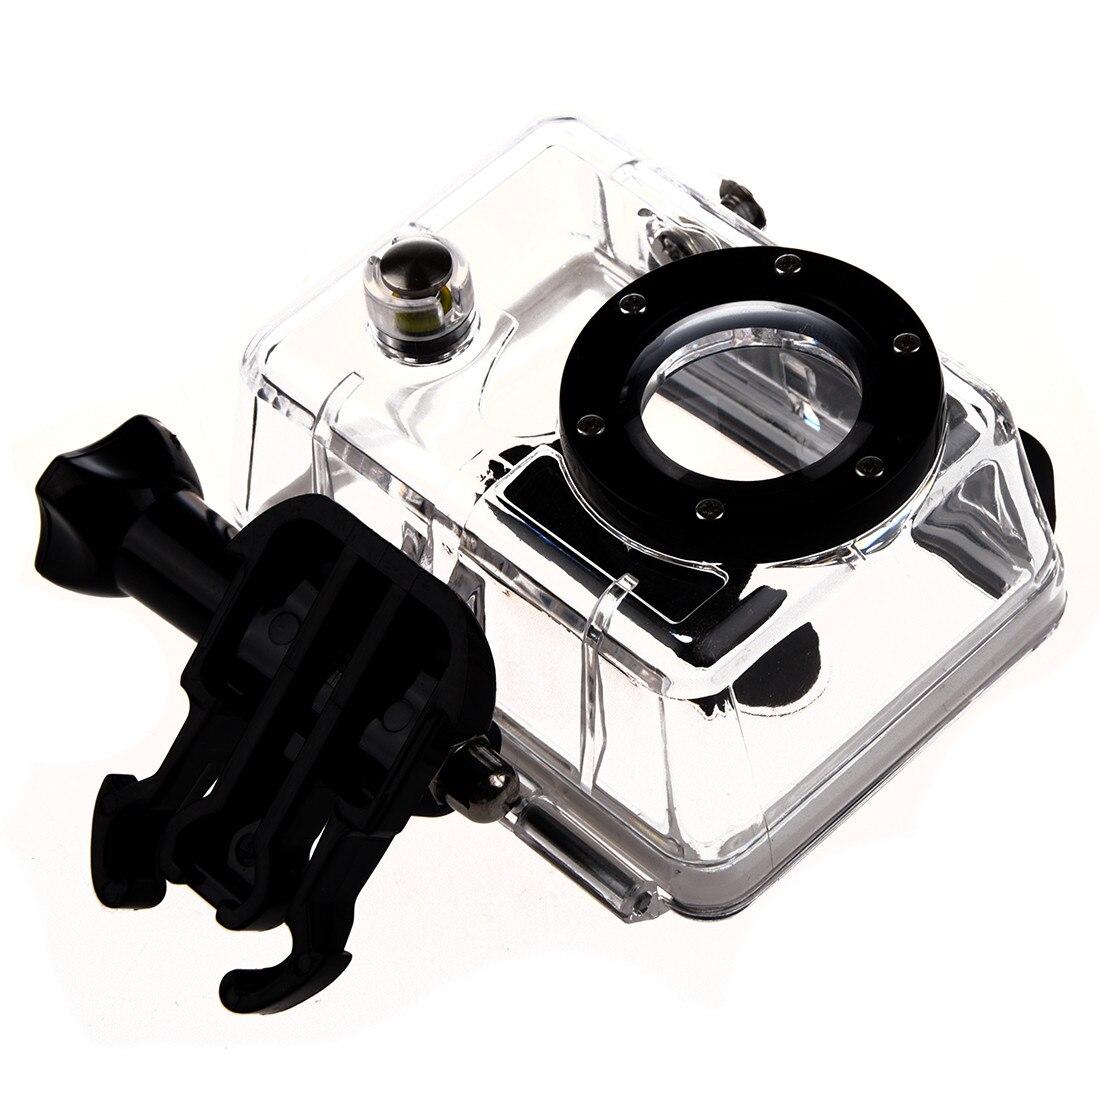 Waterproof Dive Housing Case Skeleton with Lens for Gopro Hero 2 Camera светофильтр gopro dive filter for standard housing